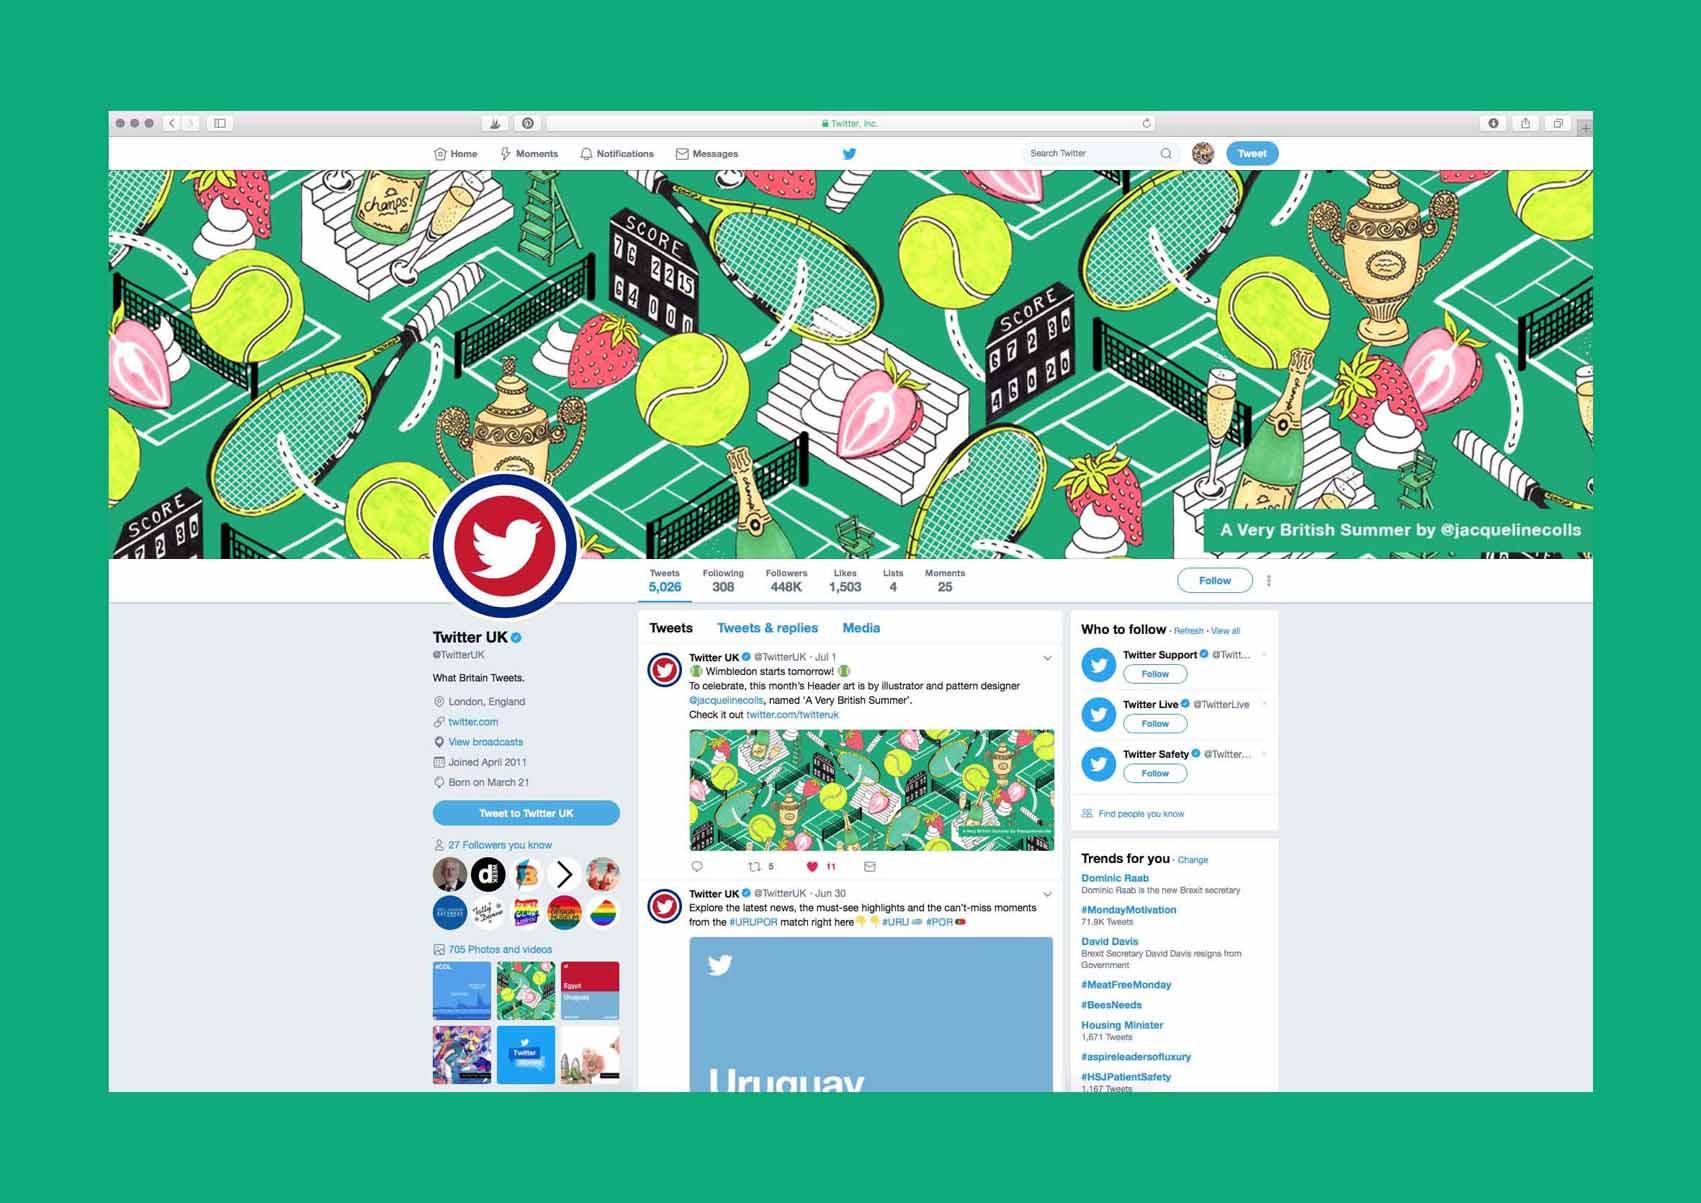 Twitter-Uk-Wimbledon-Tennis-Illustration-Header-sm.jpg